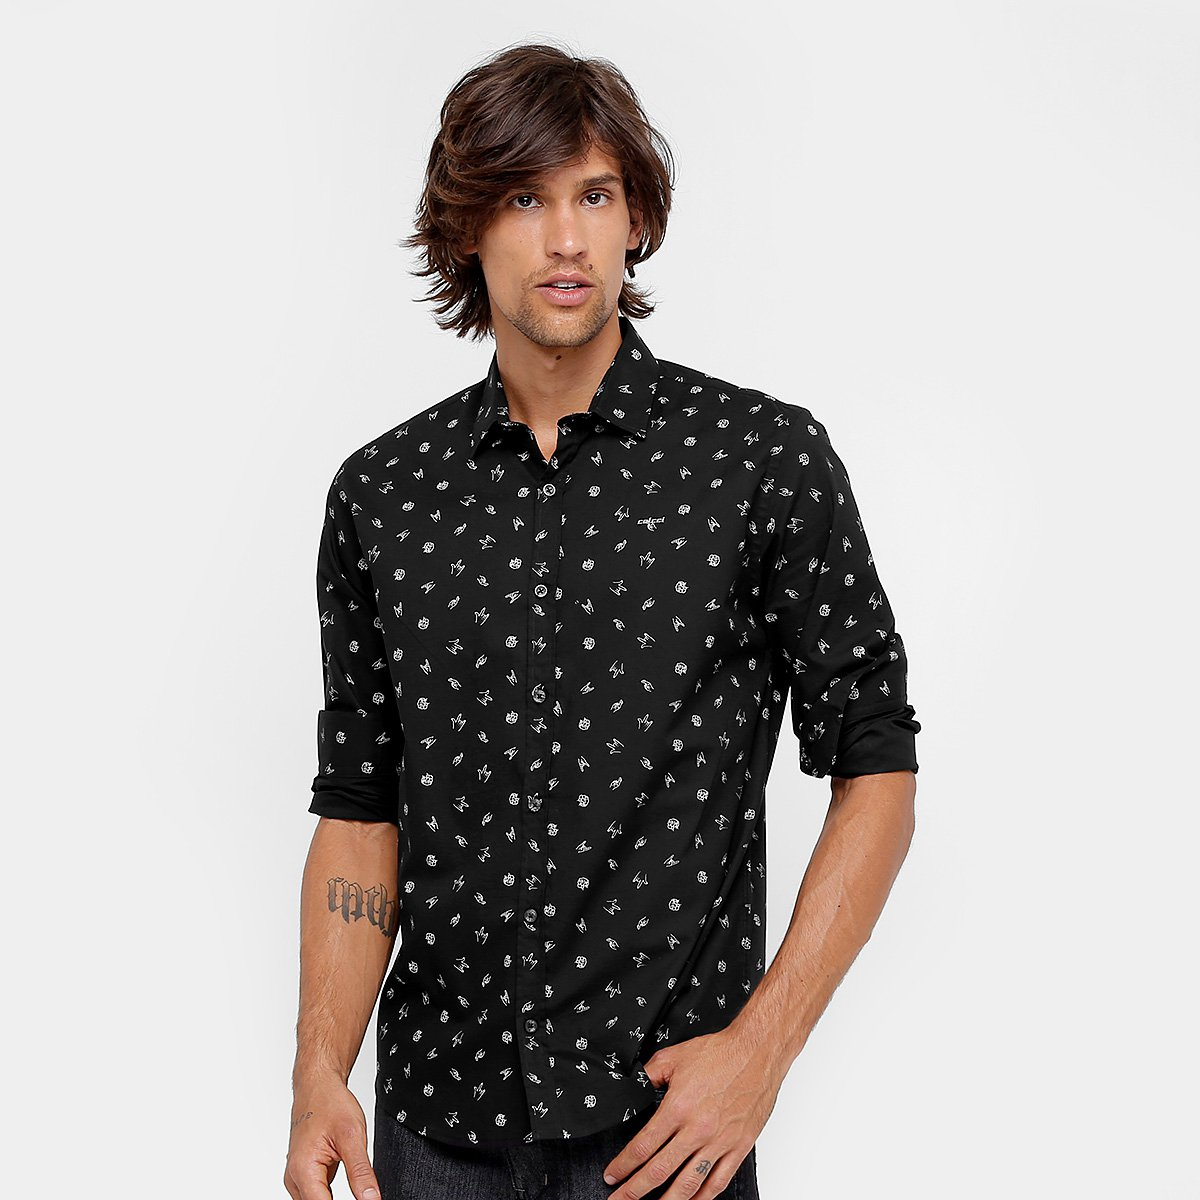 47c1c60ede Camisa Colcci Estampada Manga Longa Masculina - Compre Agora